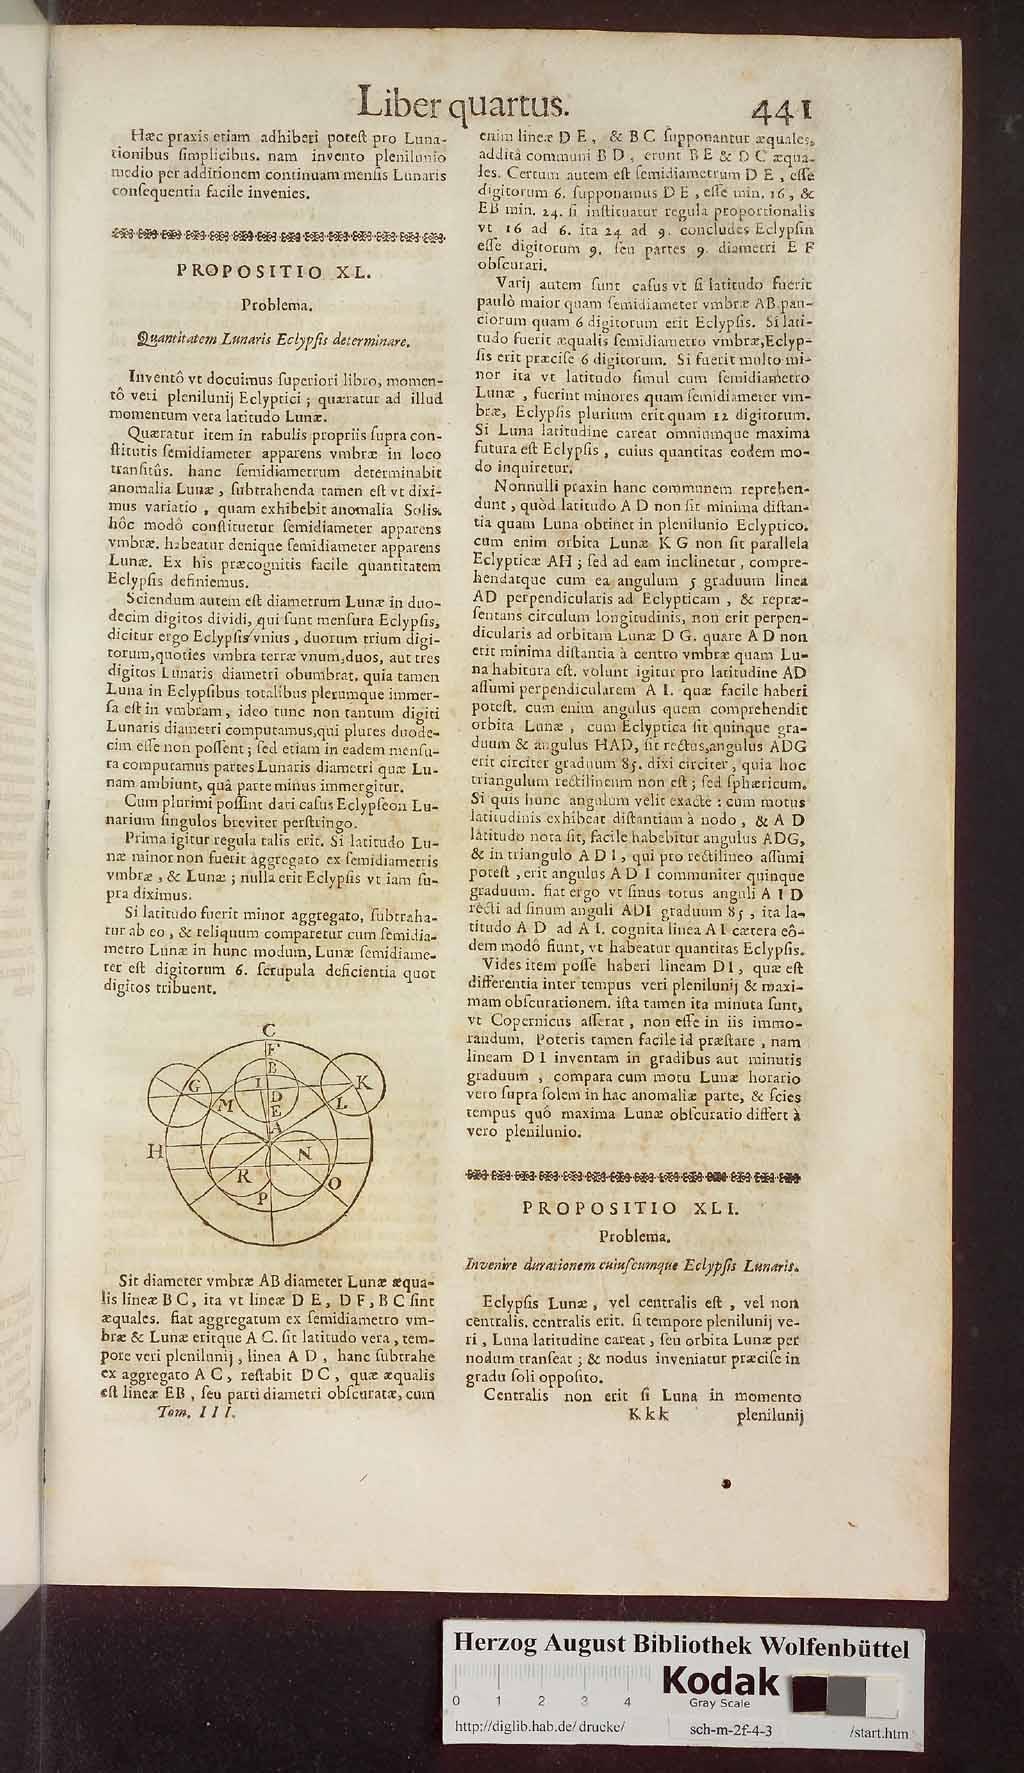 http://diglib.hab.de/drucke/sch-m-2f-4-3/00481.jpg